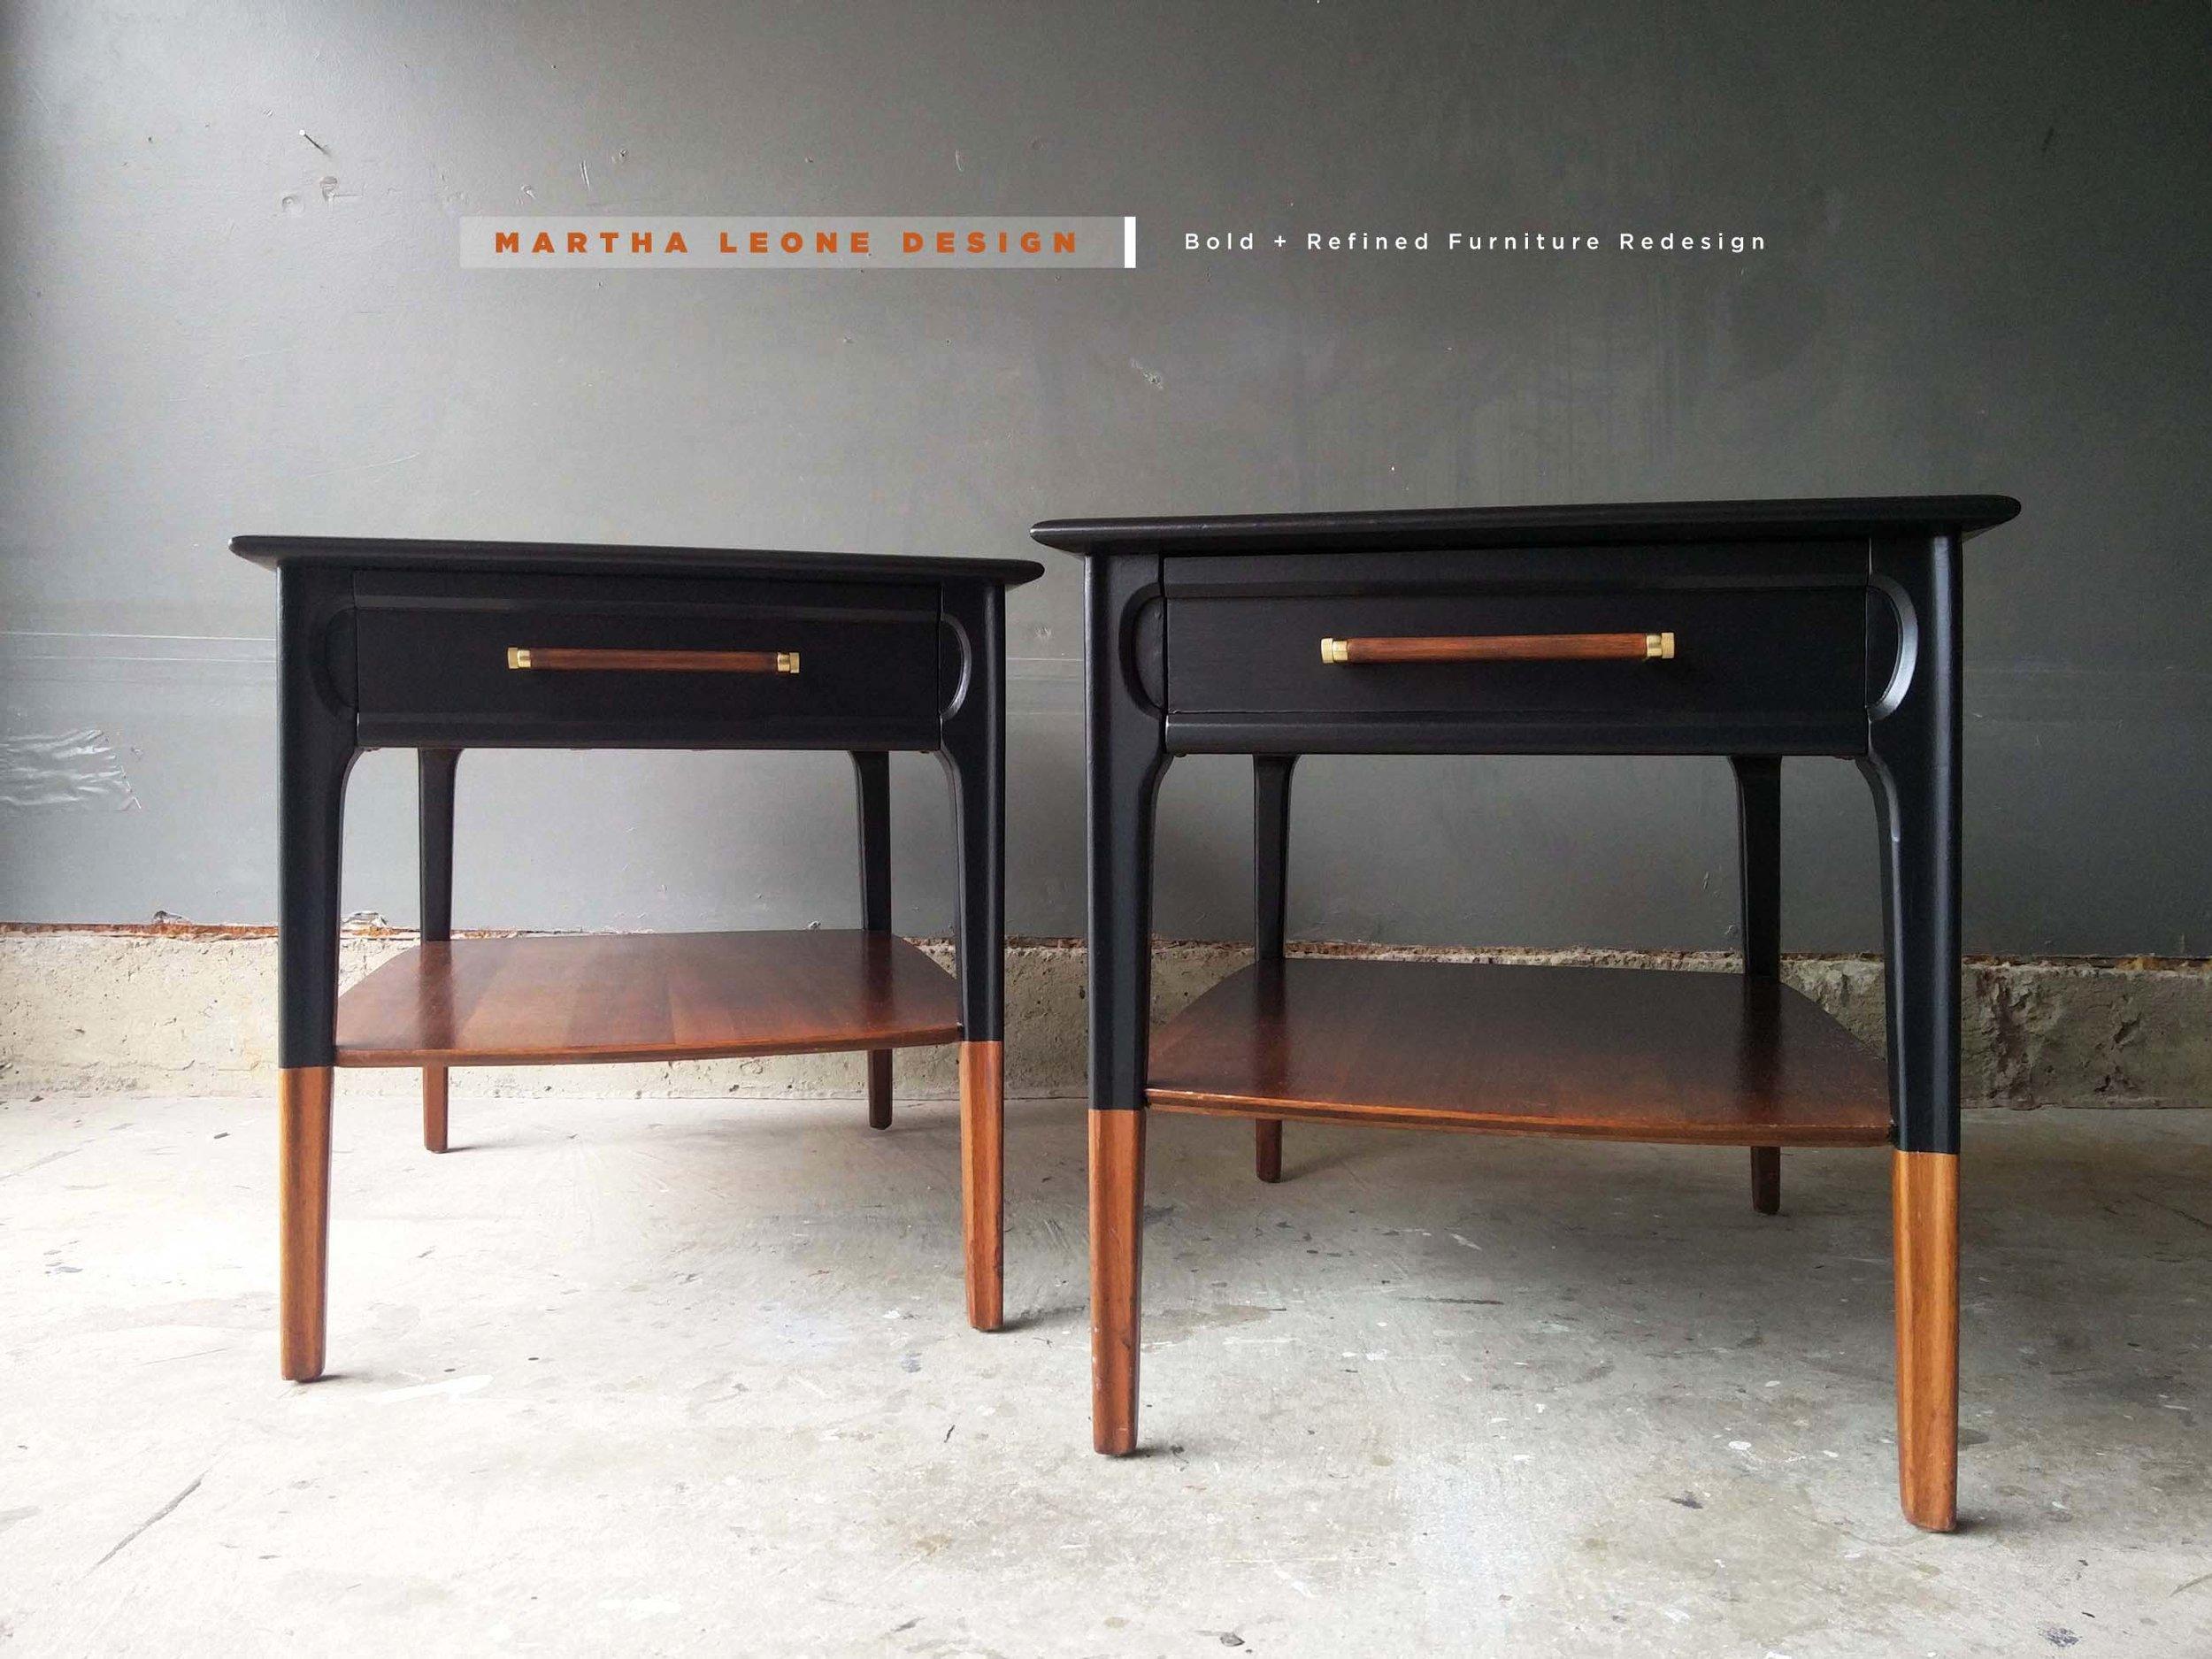 For    Boland Lord Design   , Denver, CO